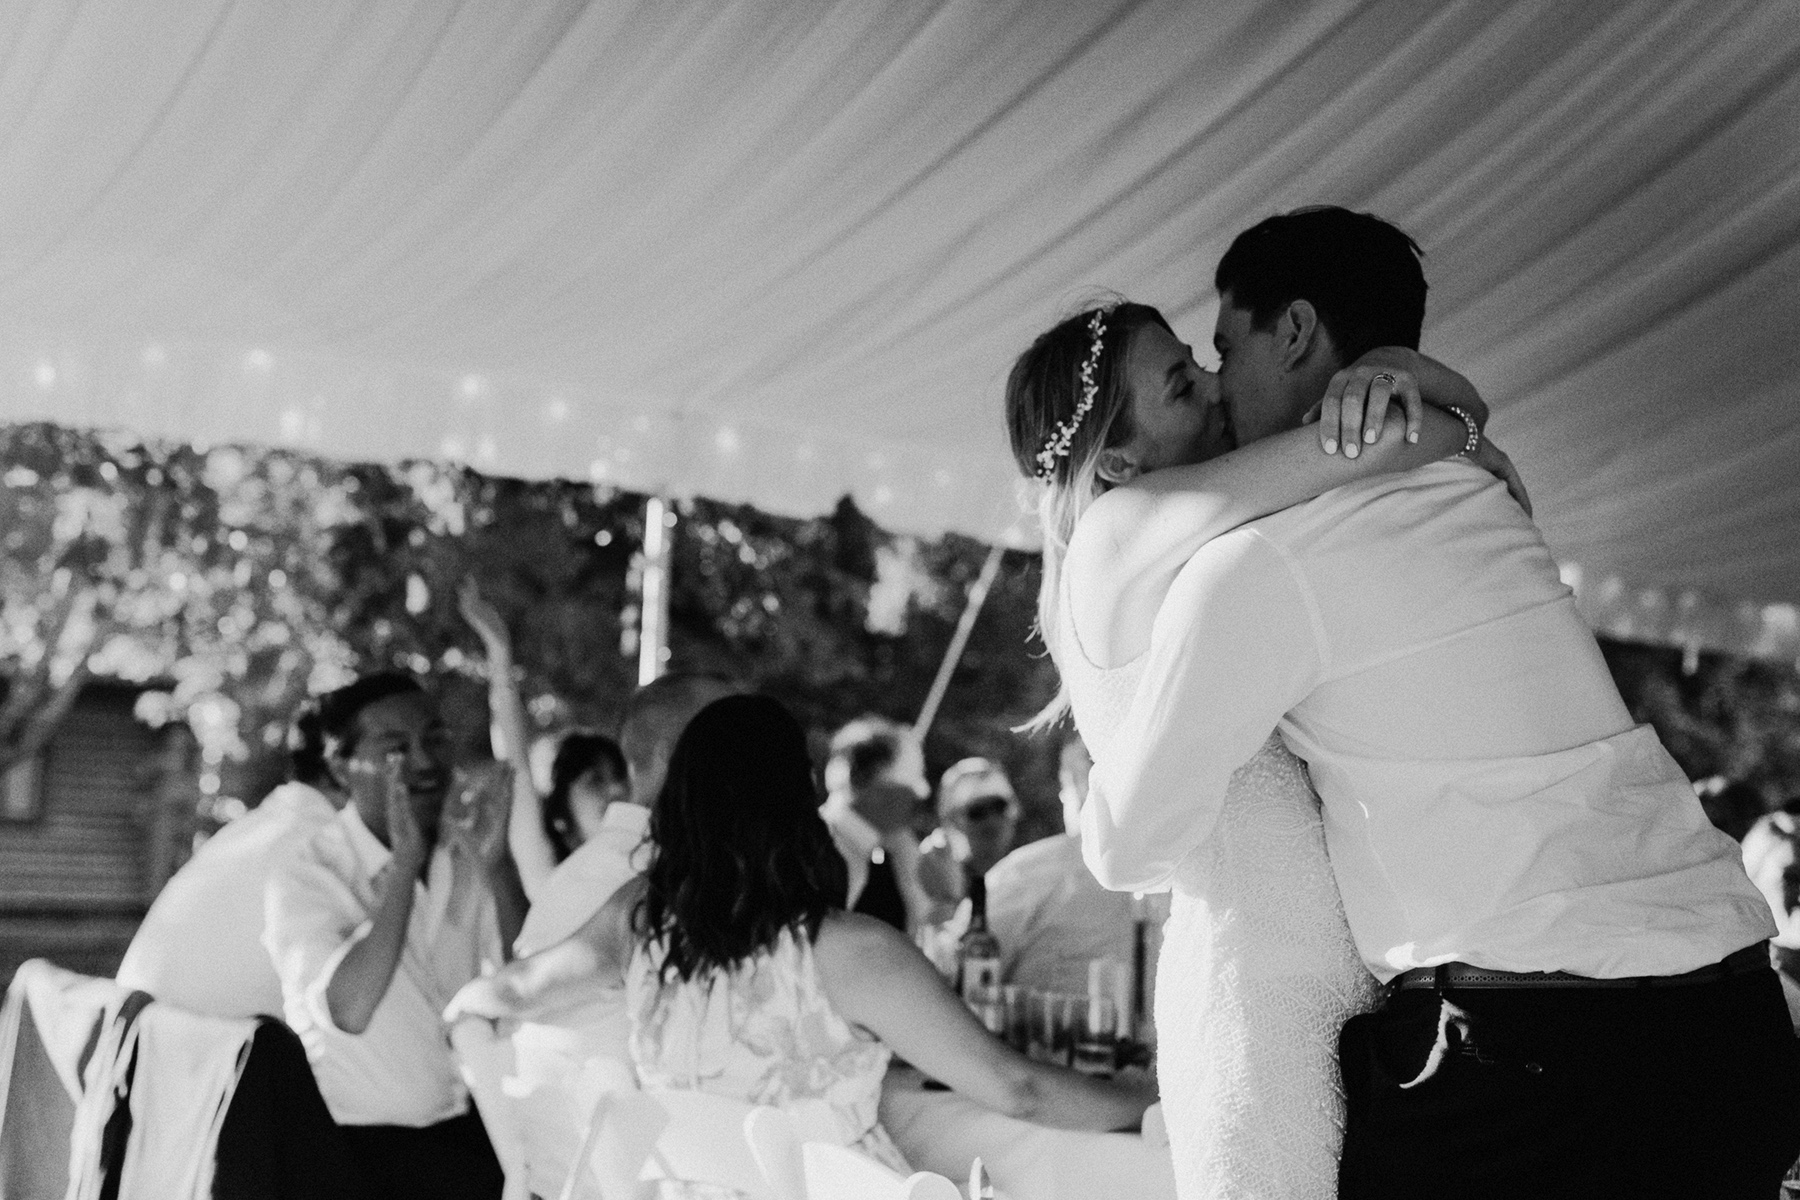 bodega-ridge-wedding-photos-0114.jpg